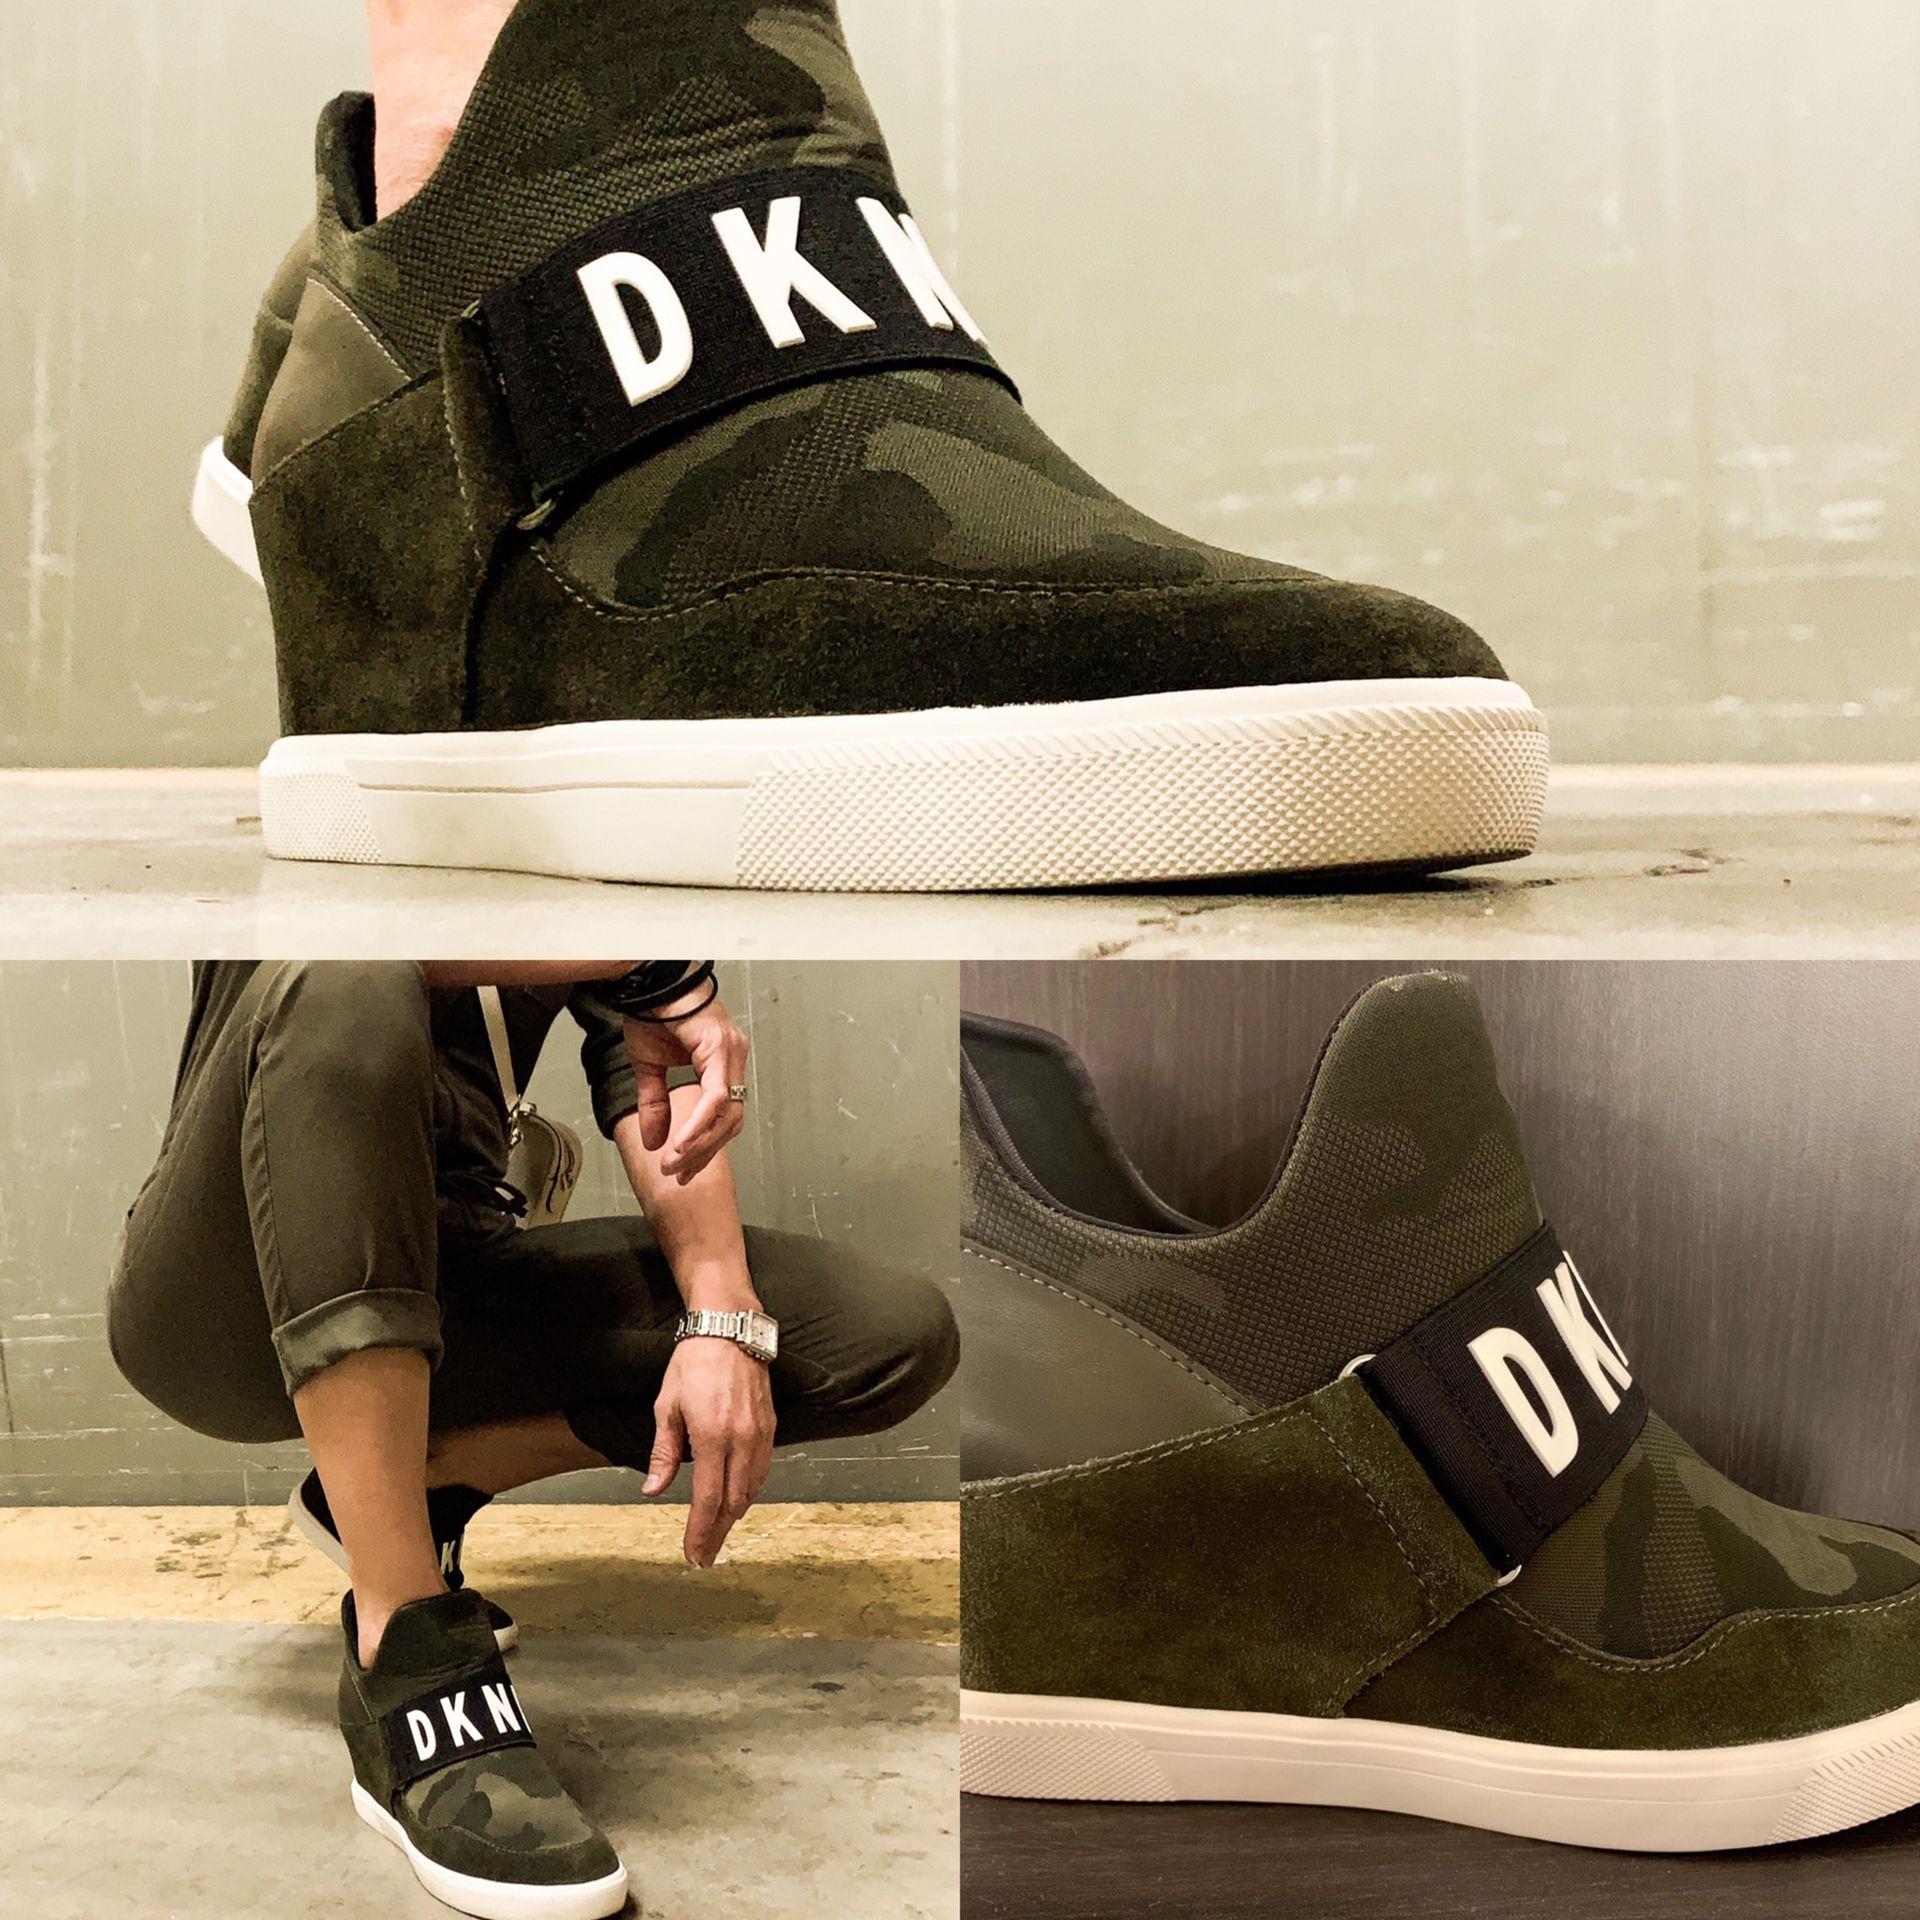 DKNY Cosmos Platform sneaker! Comfy and